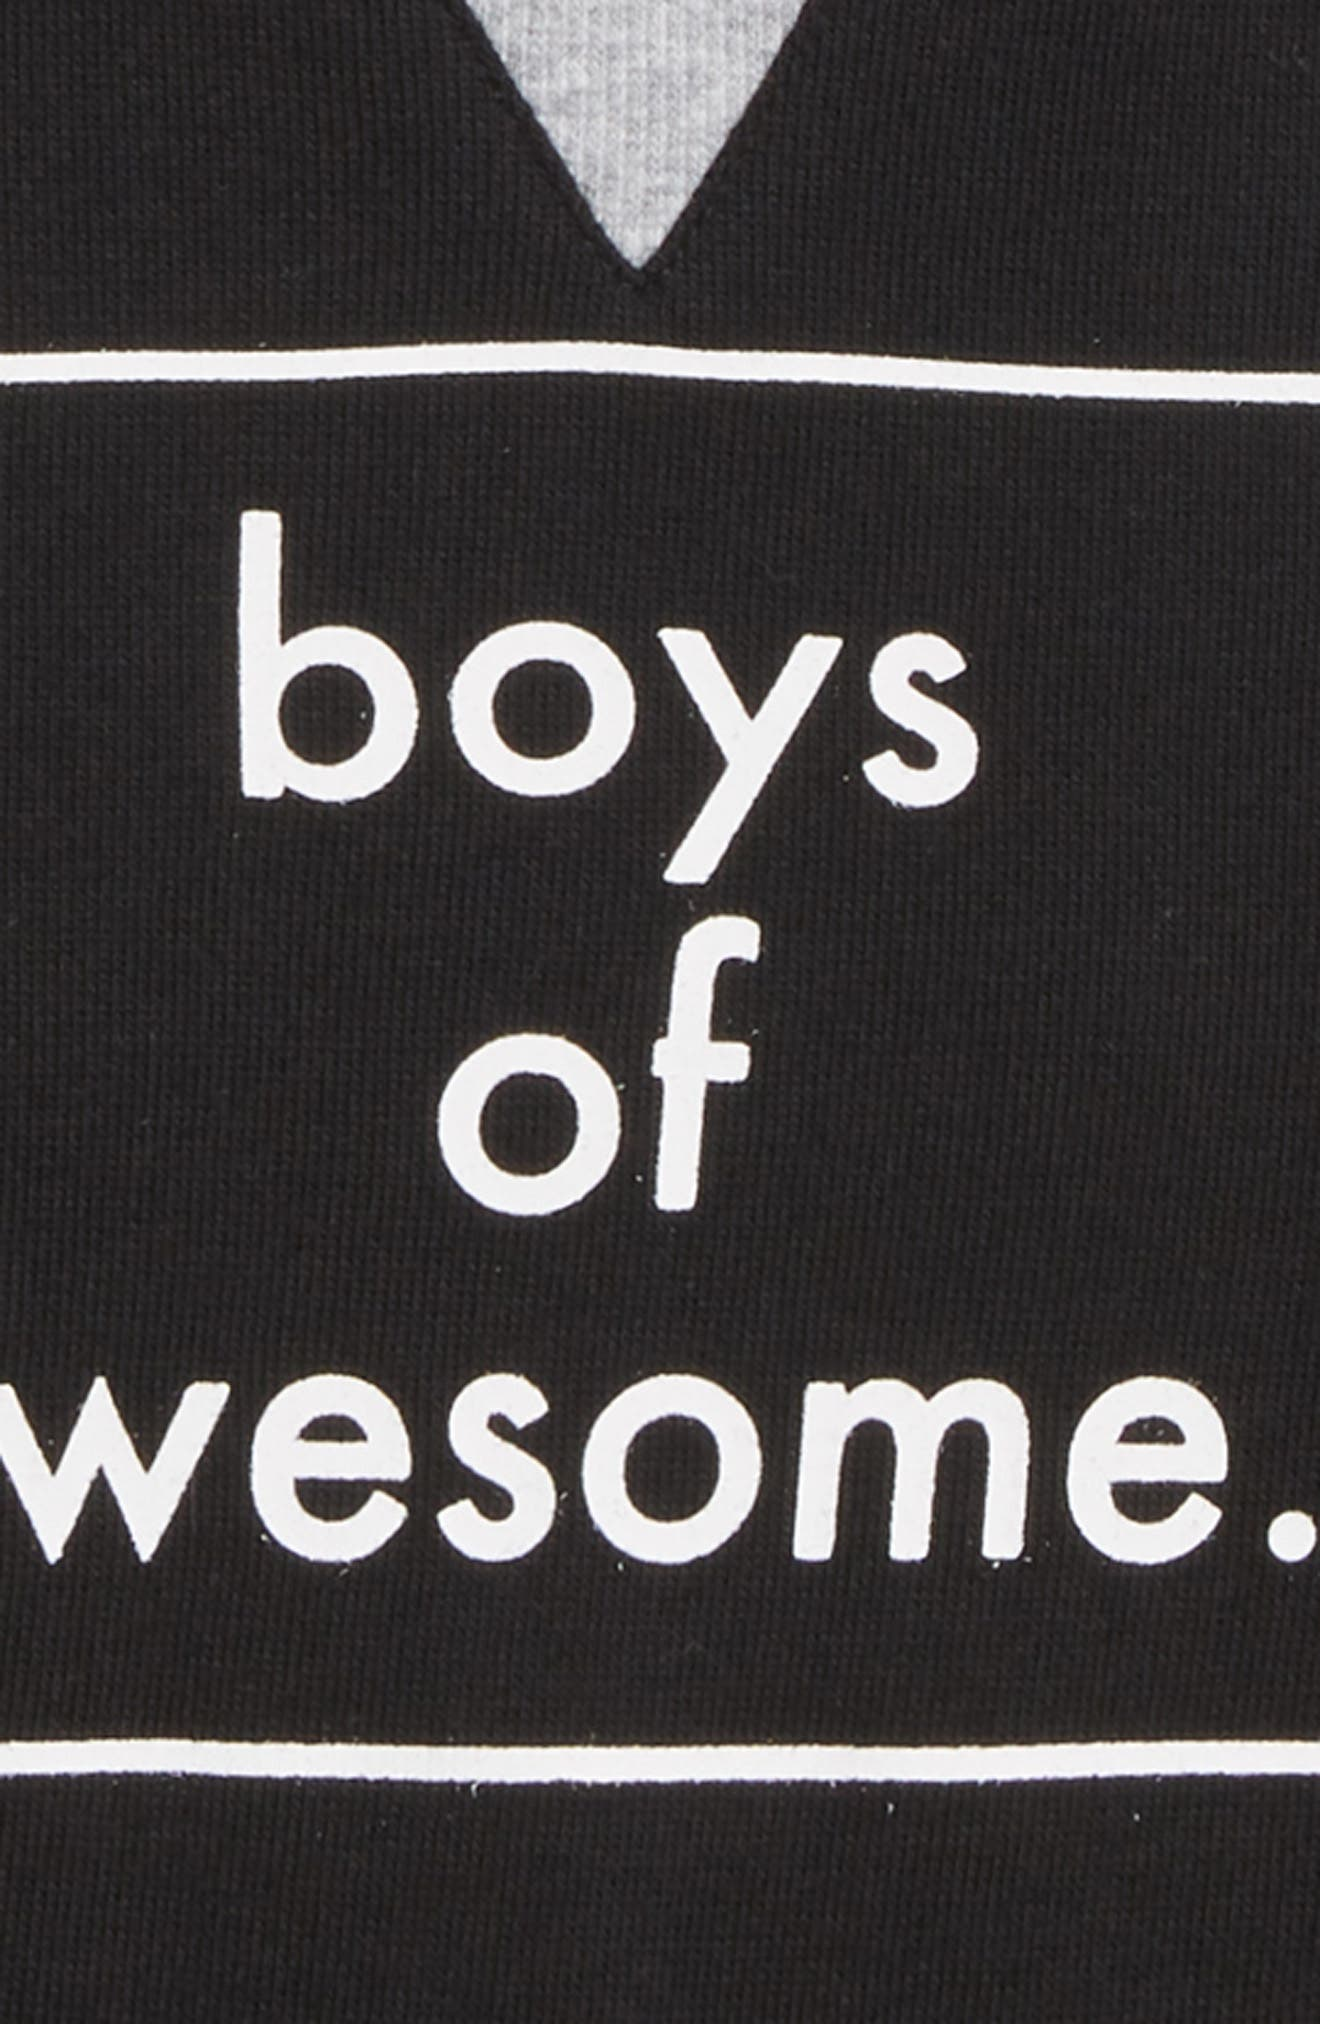 Boys of Awesome Sweatshirt,                             Alternate thumbnail 3, color,                             001